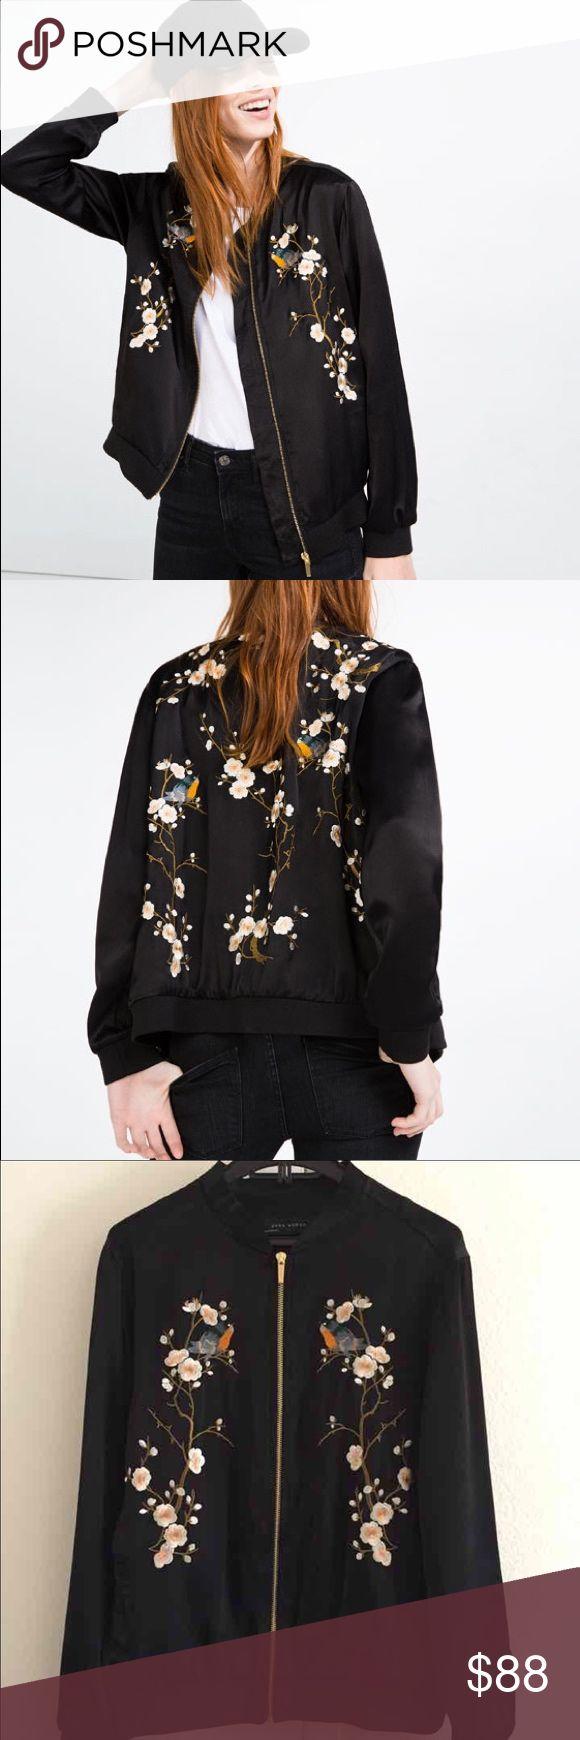 ZARA Embroidered Silky Bomber Jacket Gorgeous silky bomber jacket purchased at ZARA. Zara Jackets & Coats